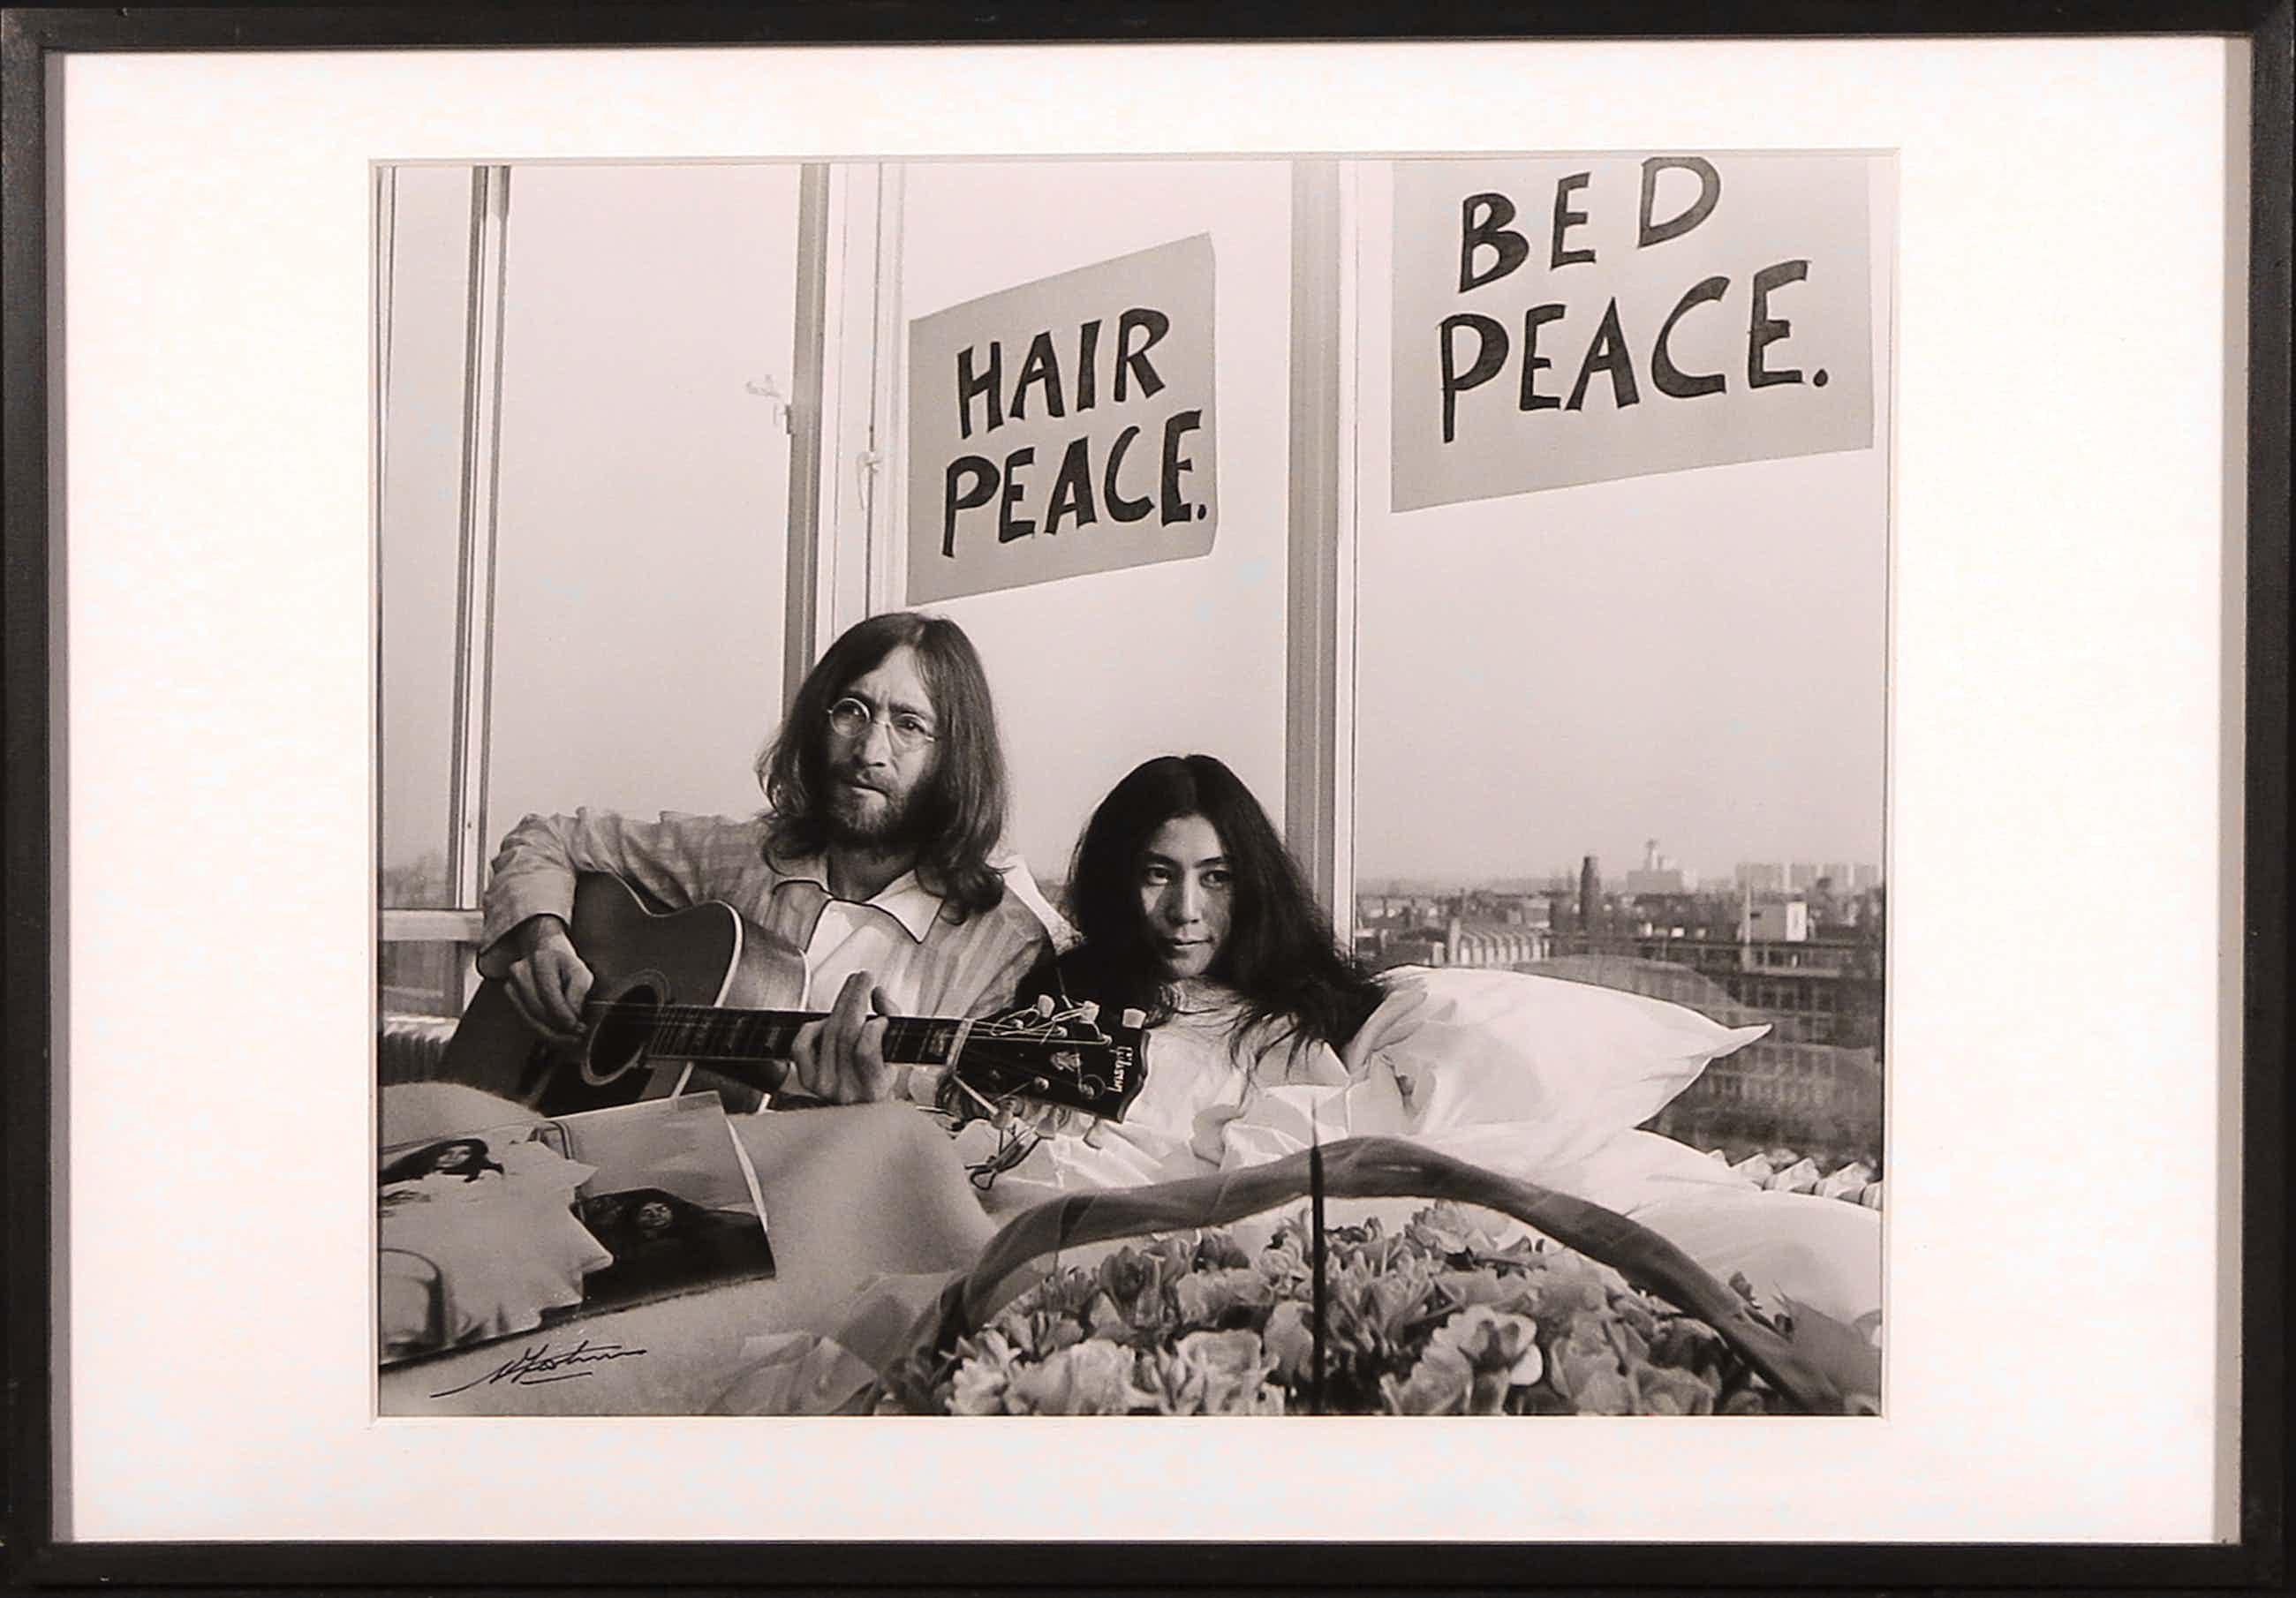 Nico Koster - Foto, John Lennon & Yoko Ono - Ingelijst kopen? Bied vanaf 160!